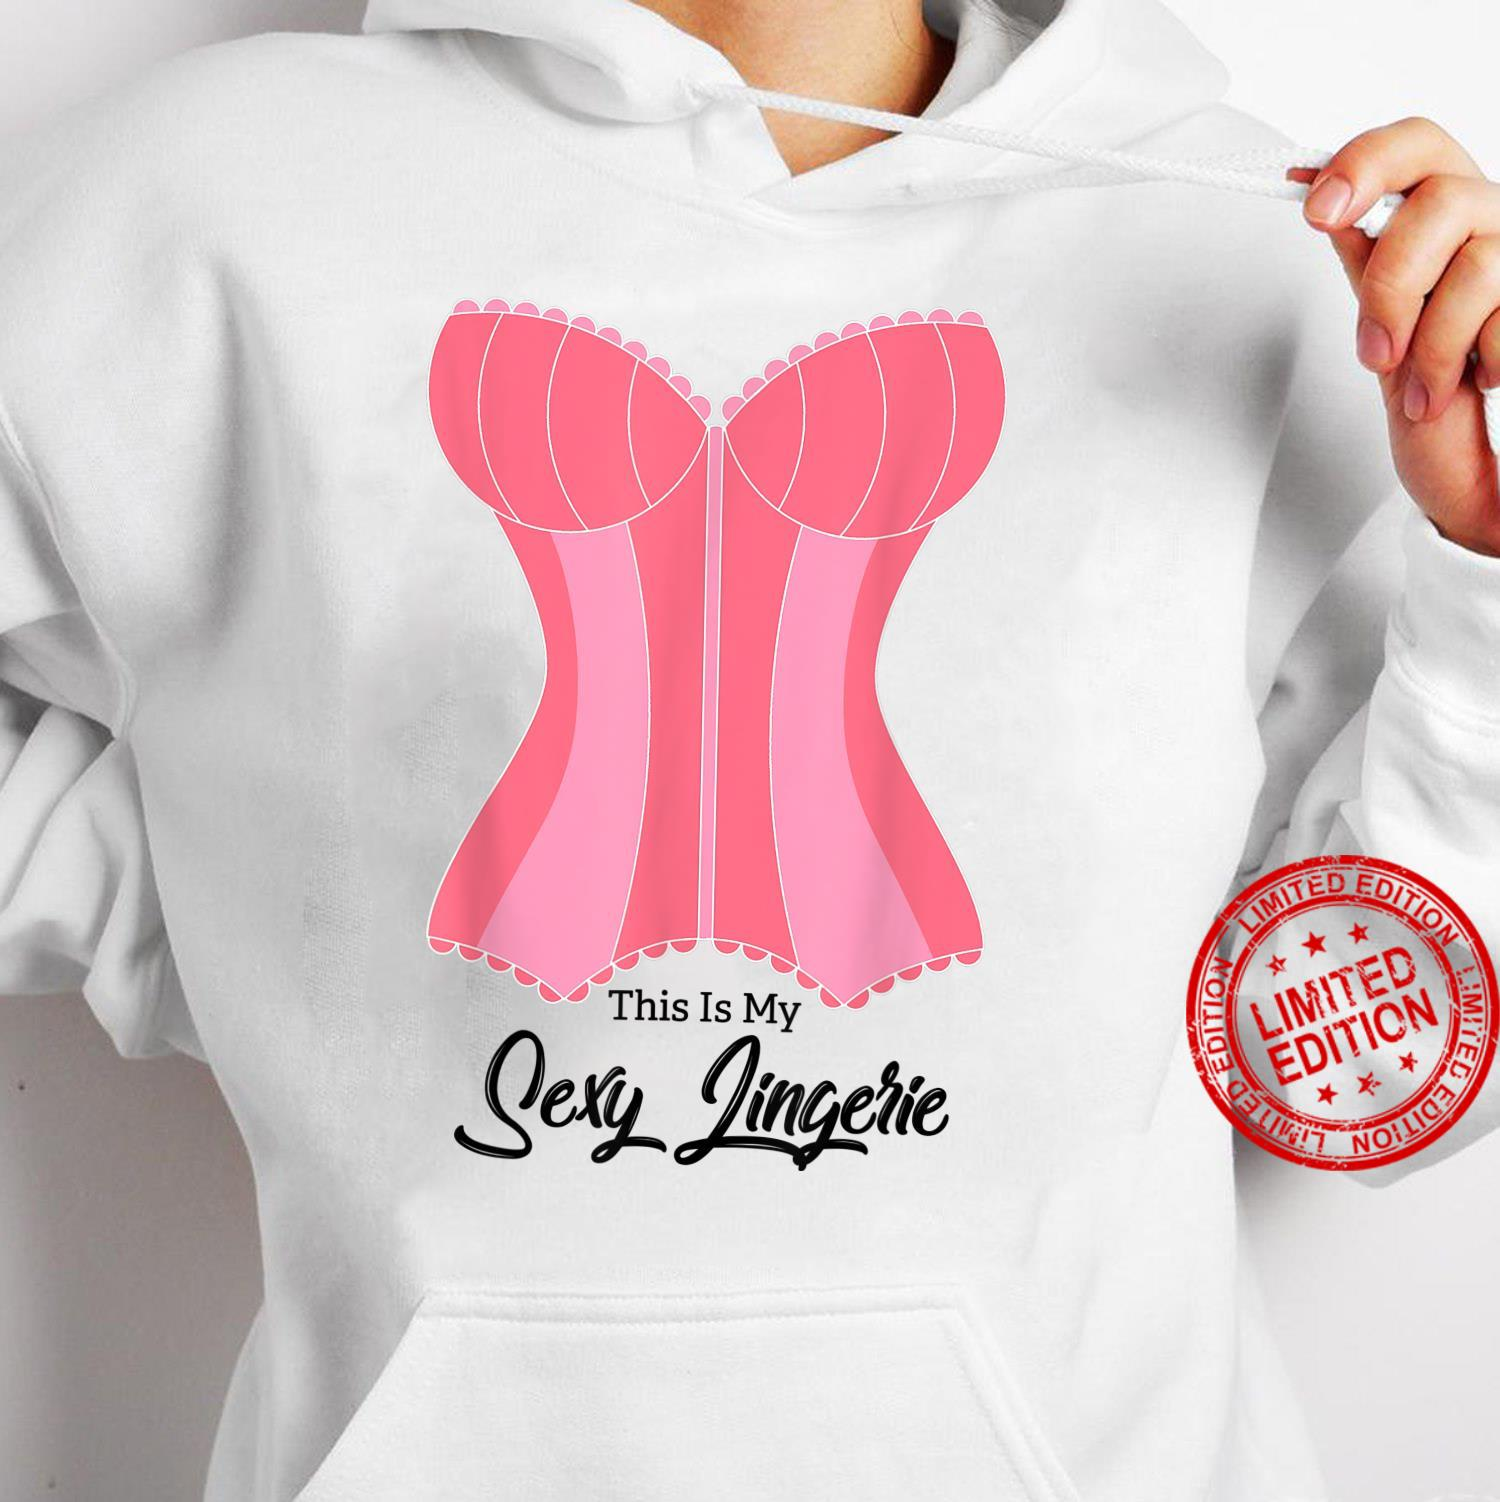 This Is My Sexy Lingerie Naughty Fun Nighties Humor Quote Shirt hoodie